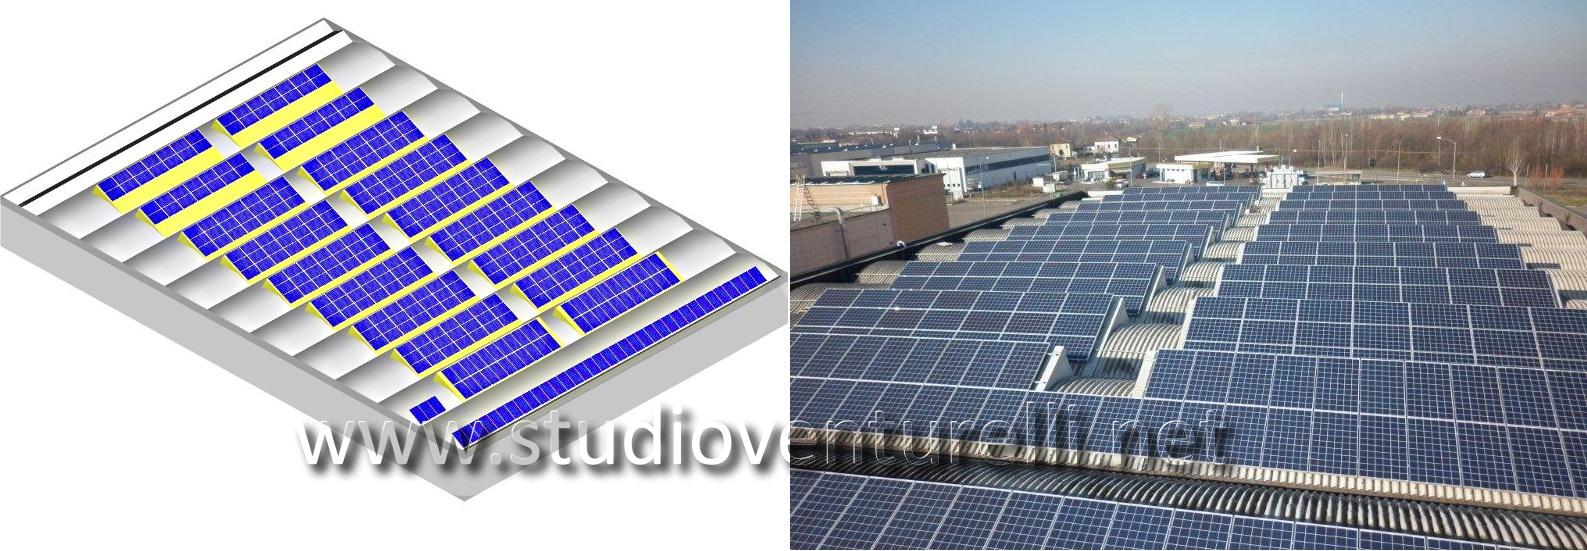 Impianto FTV da 89,7 kW